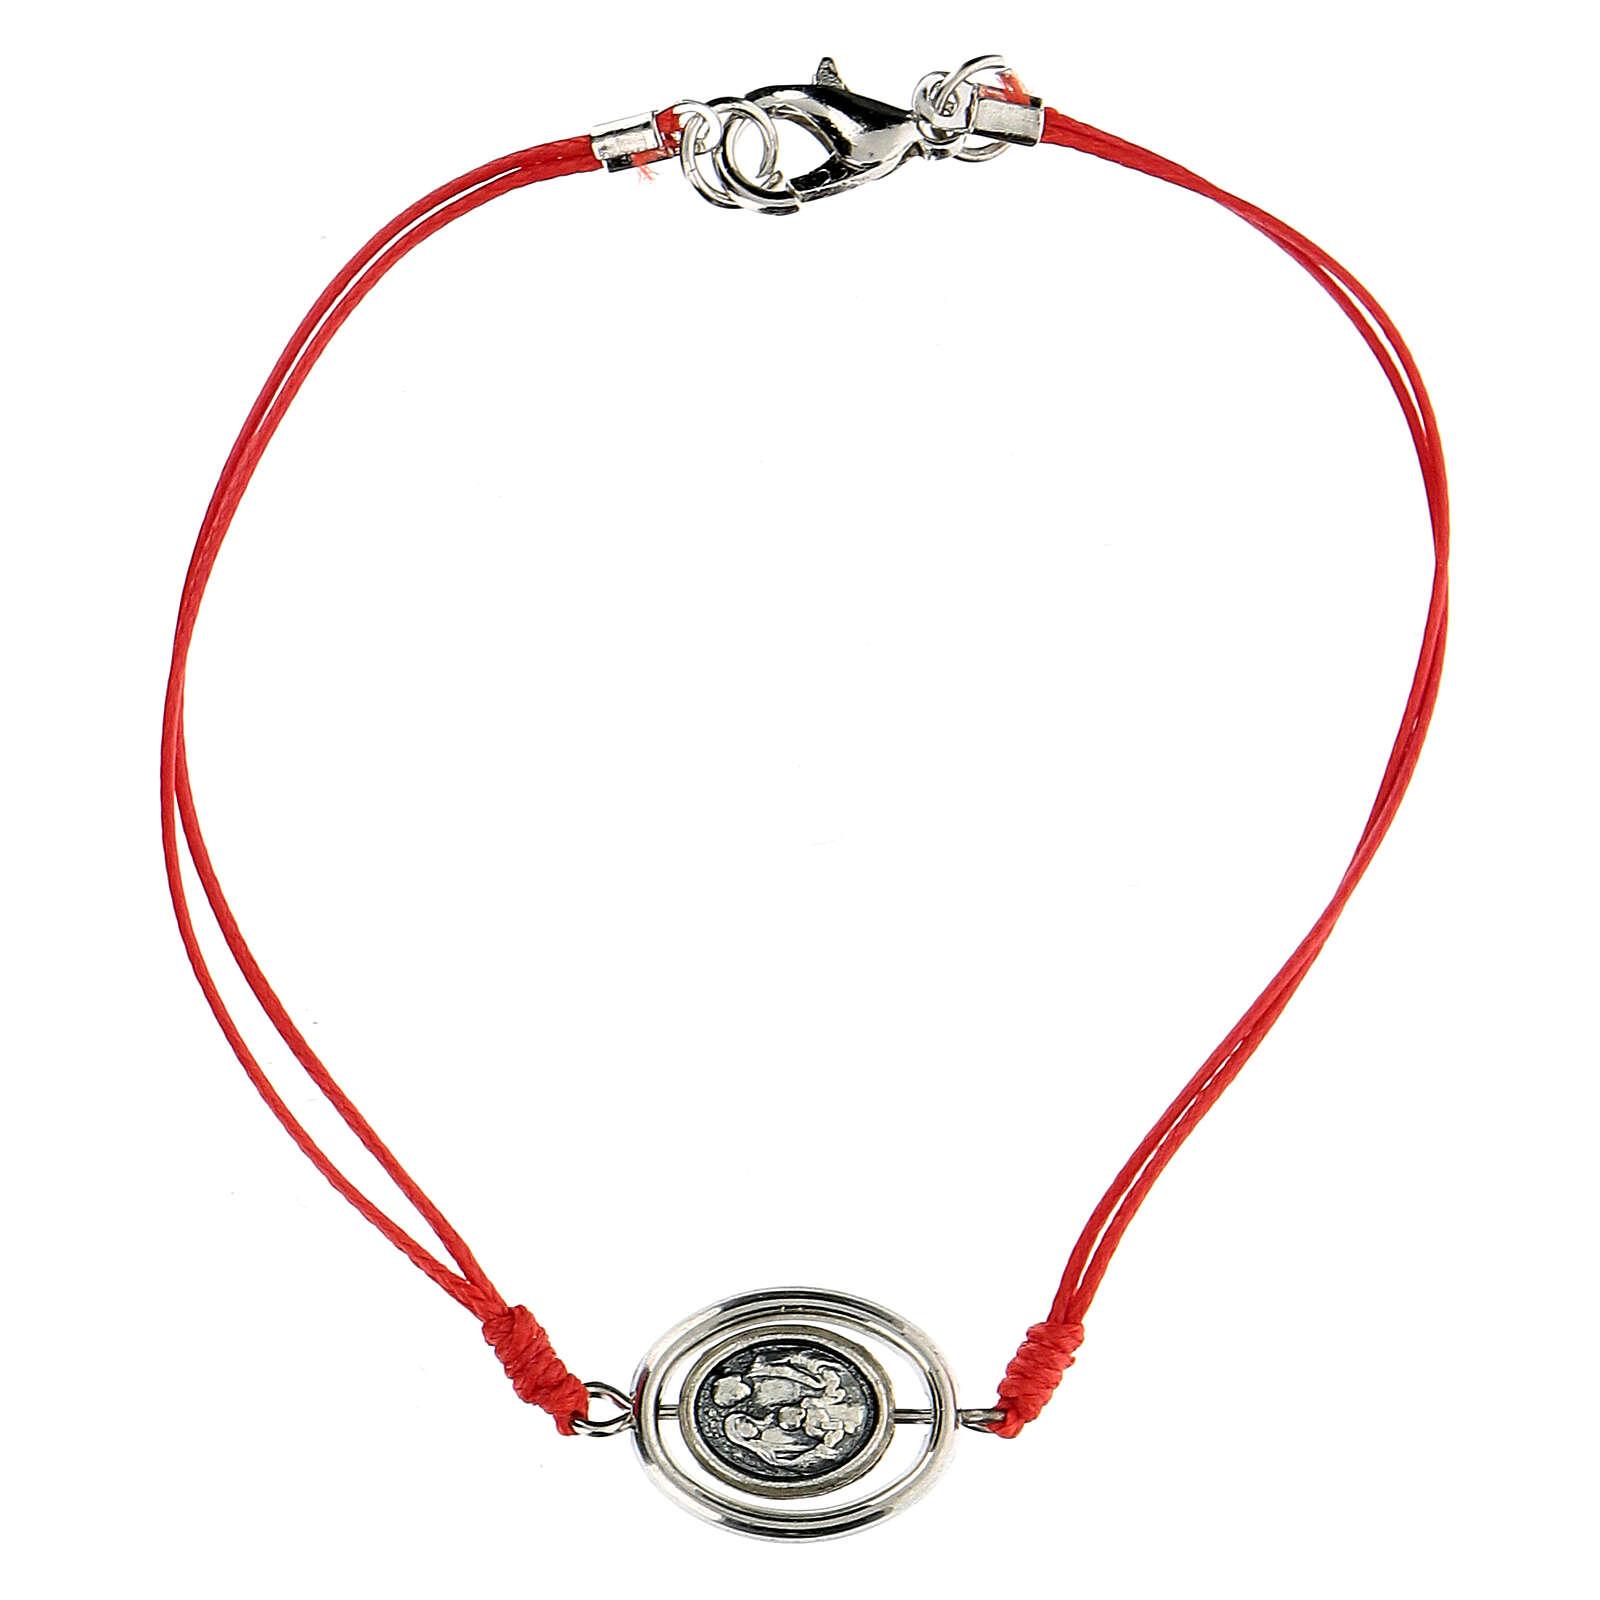 Bracelet Sainte Famille corde rouge 9 mm 4